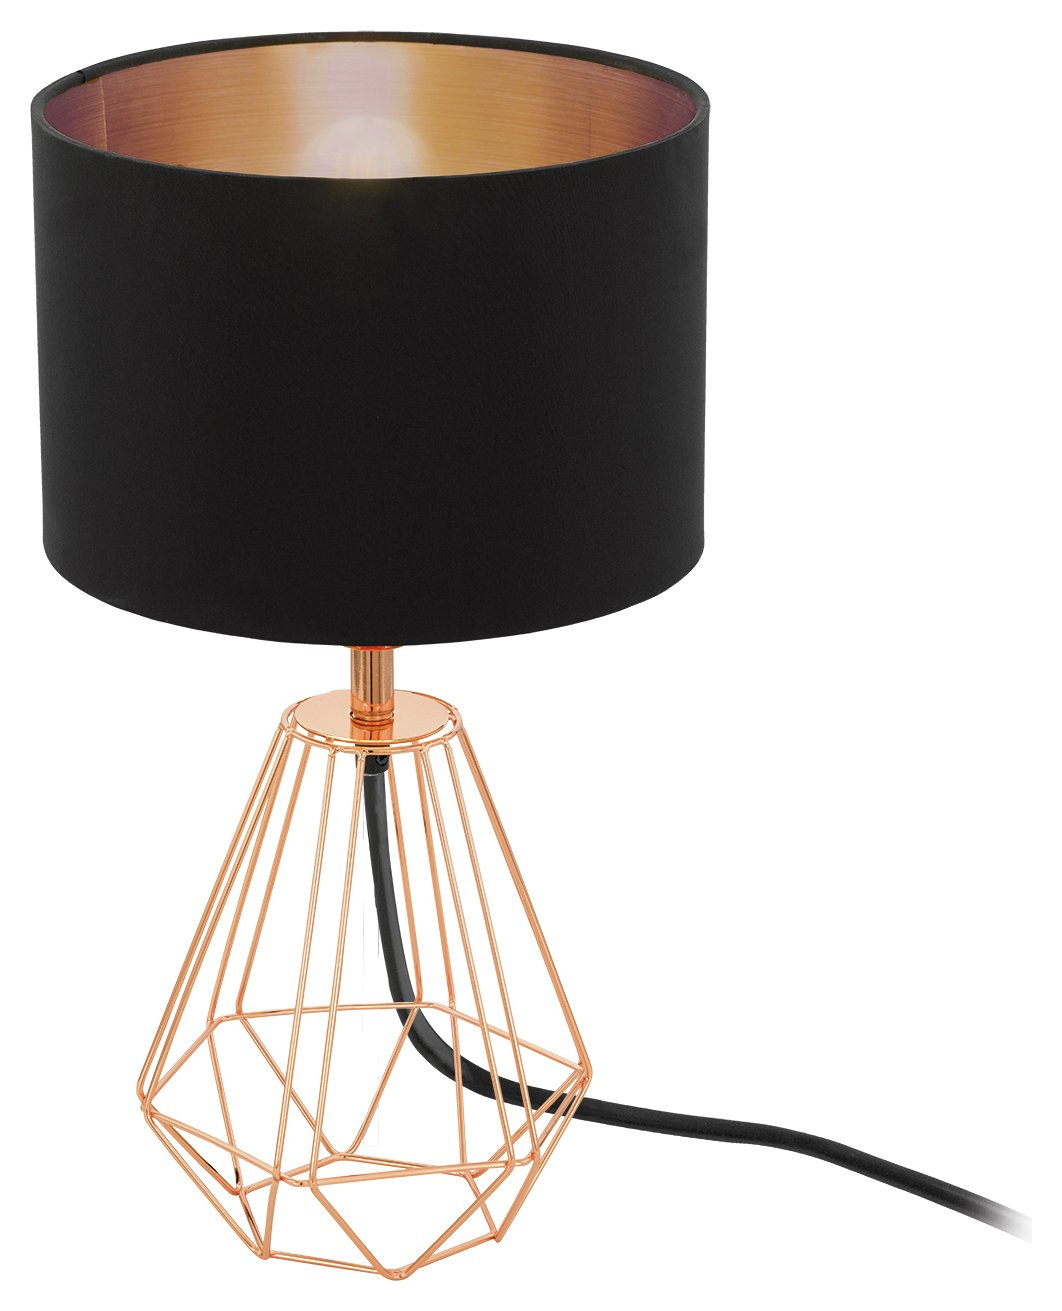 Eglo Carlton Vintage Table Lamp - Copper & Black